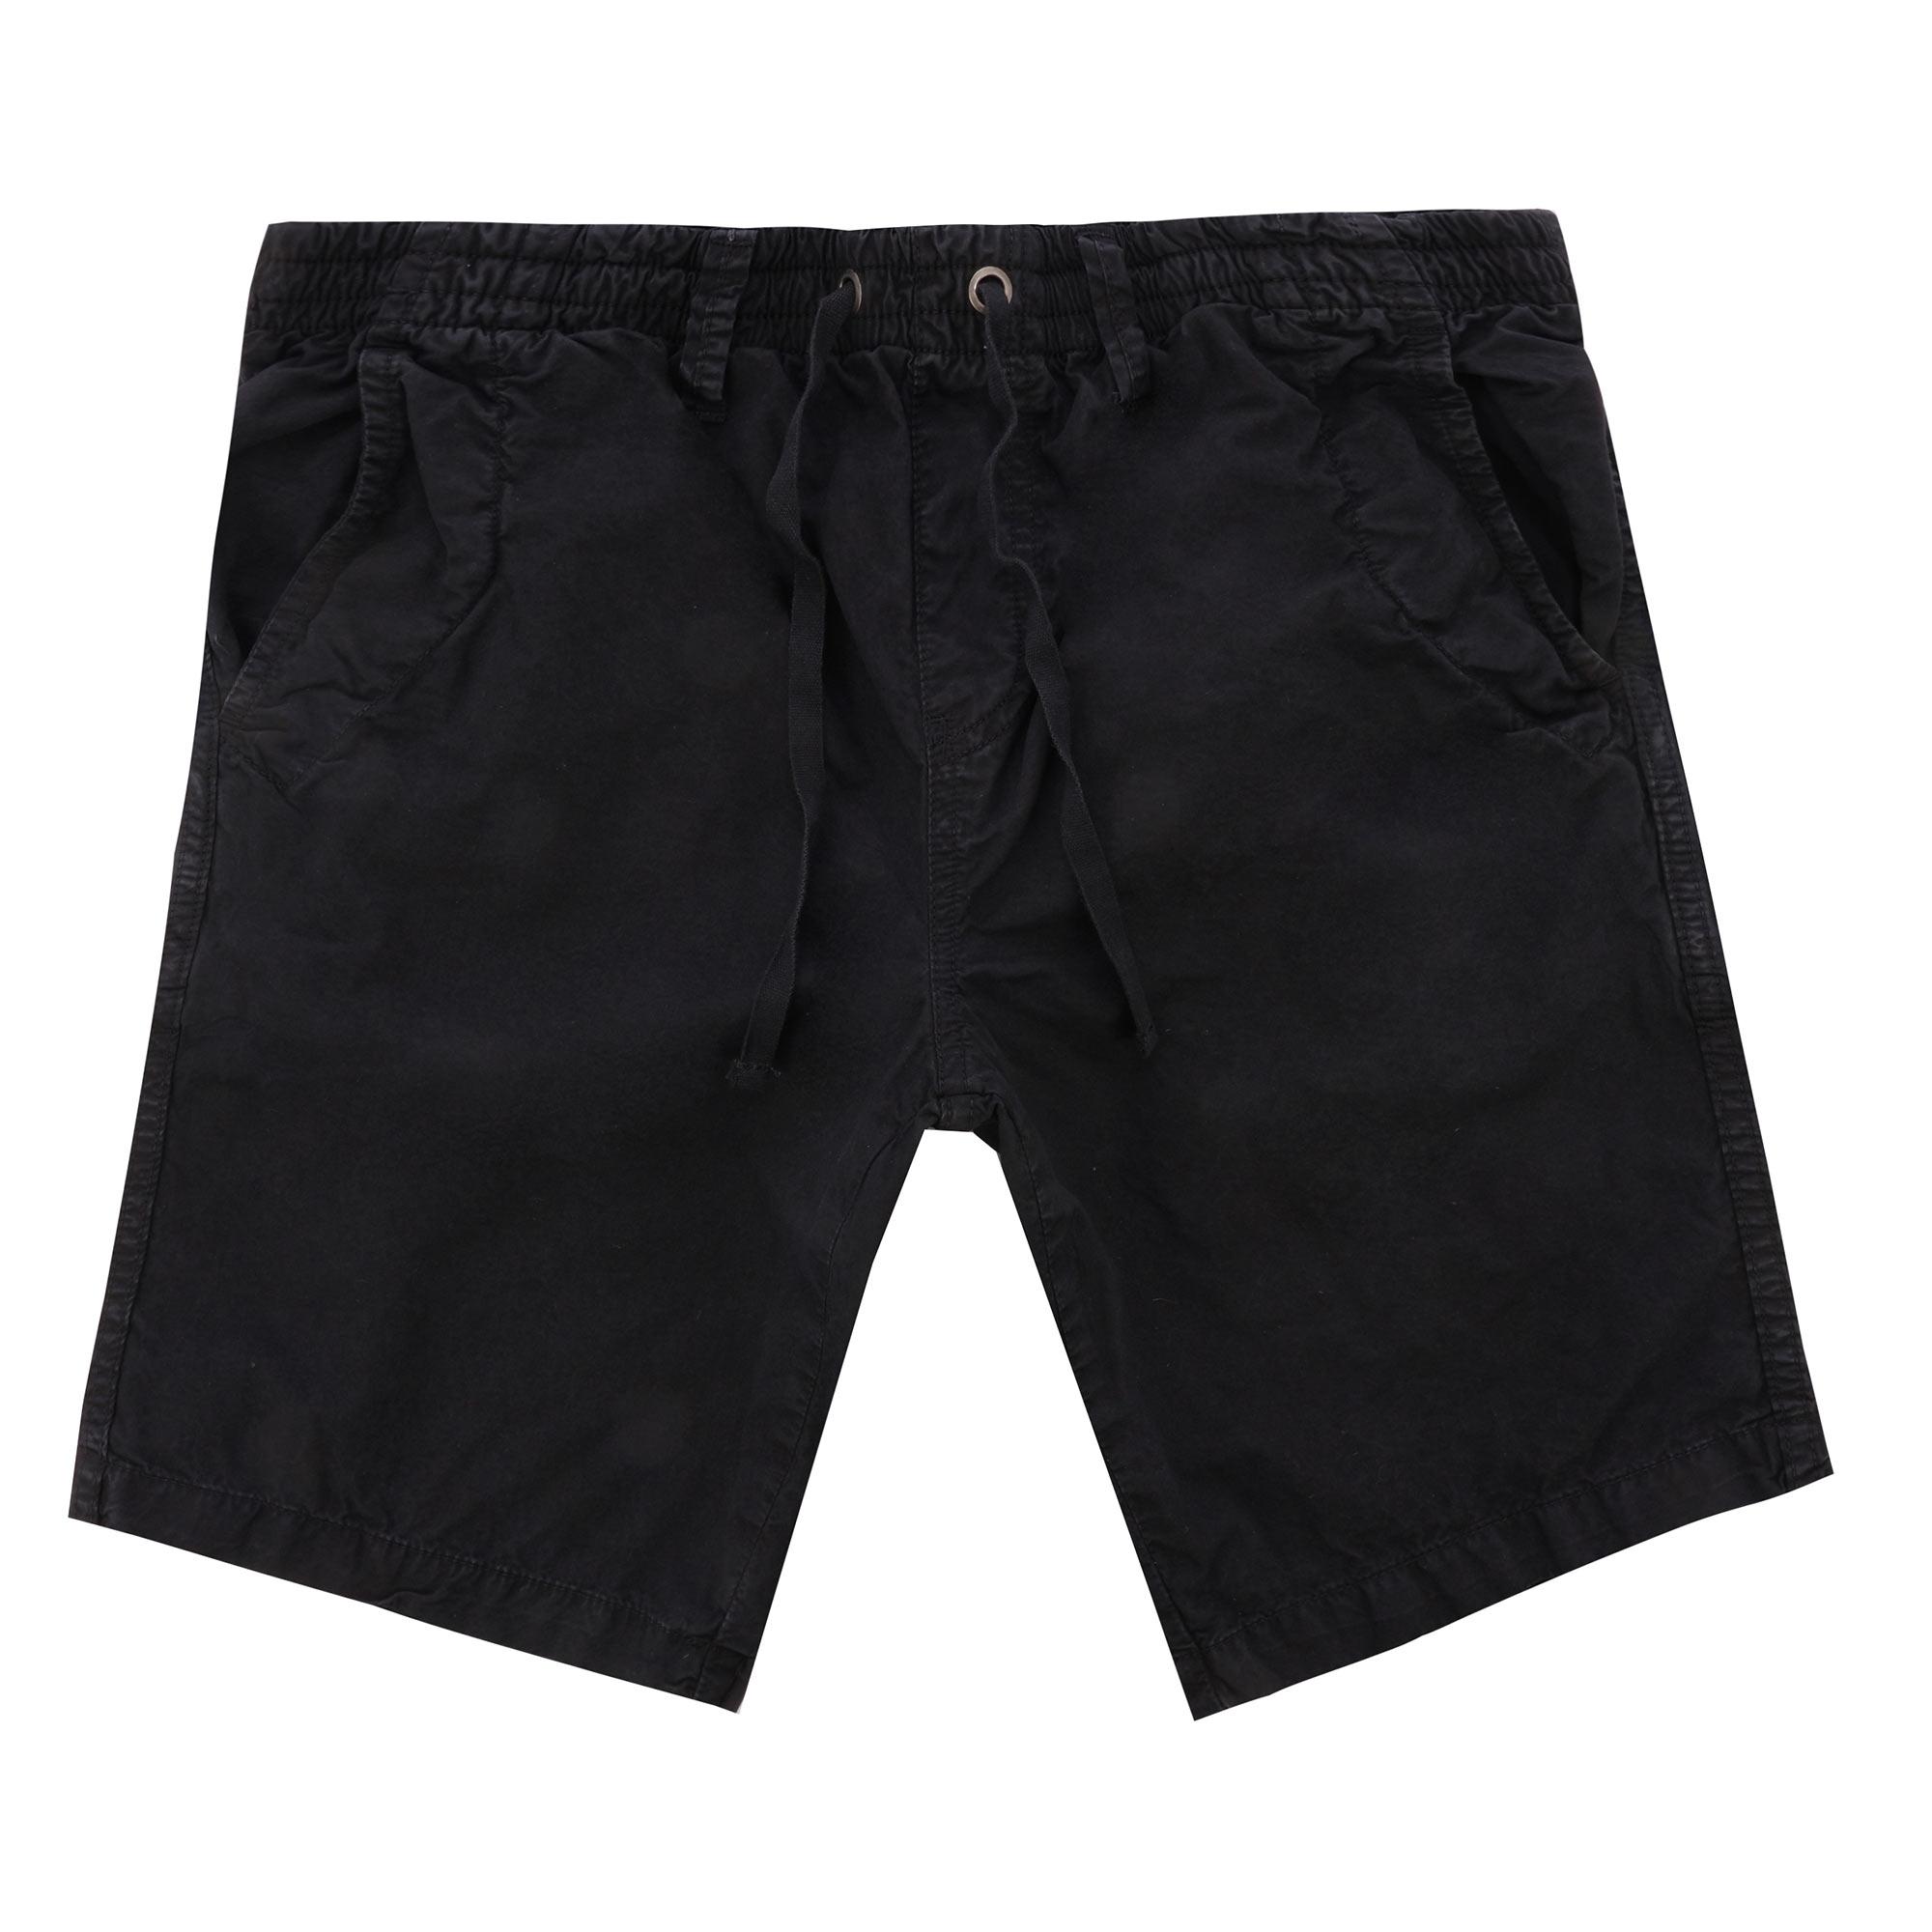 Image of Beach Shorts - Black